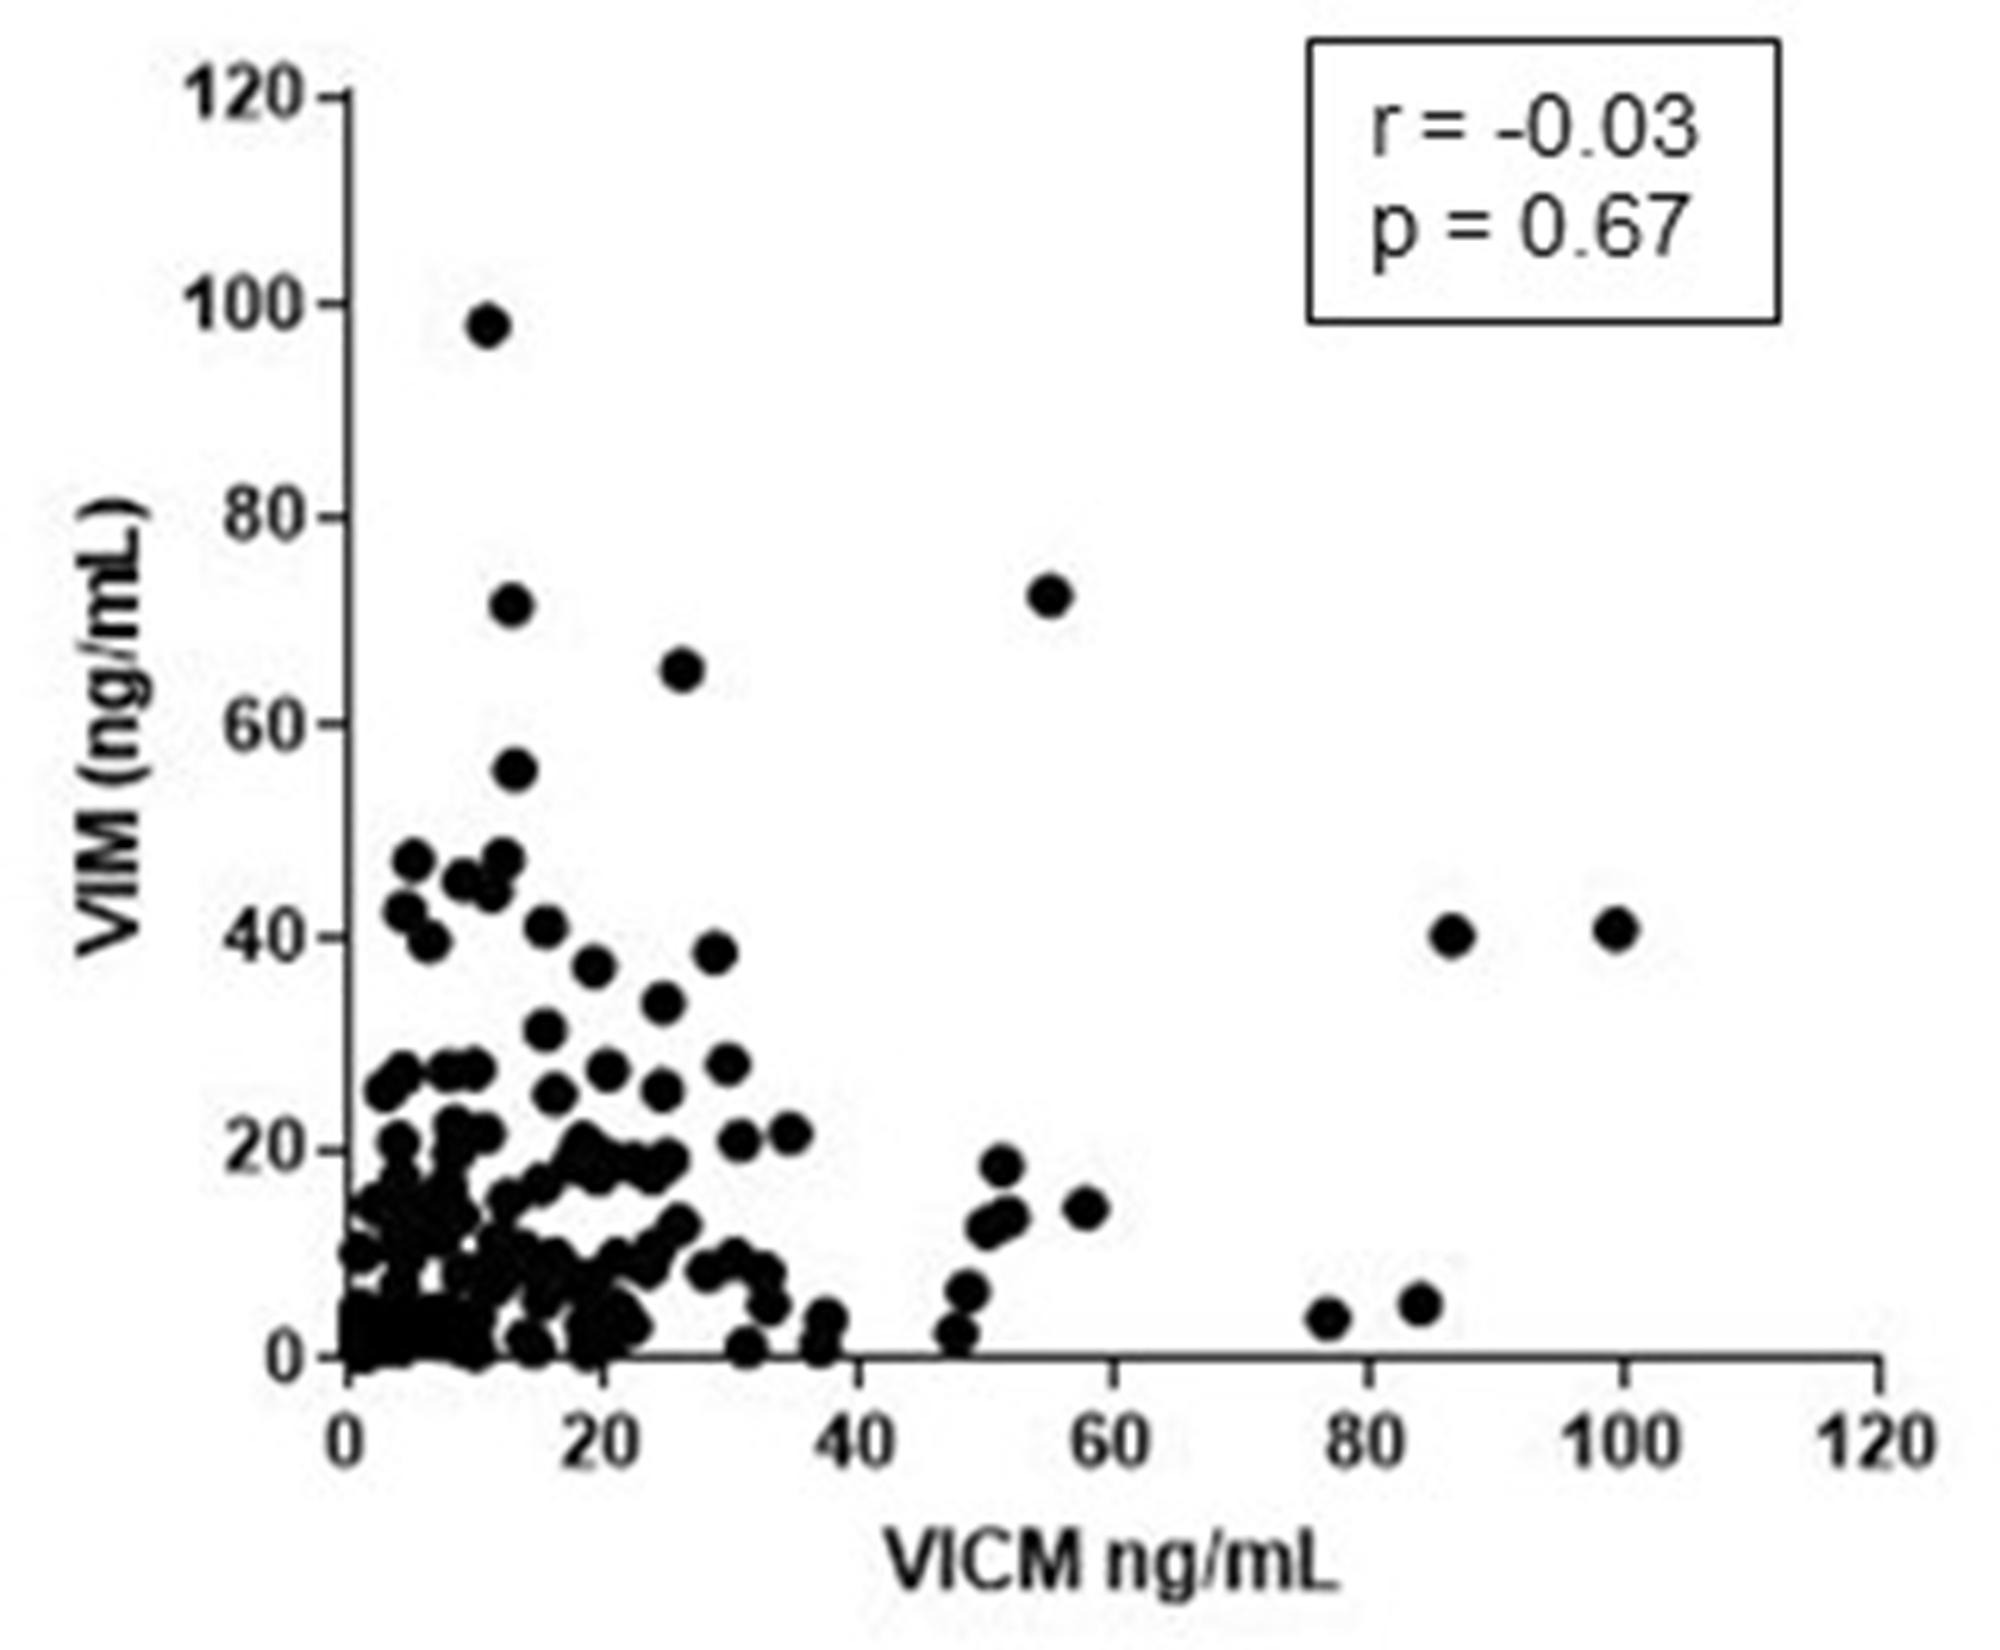 Correlation between MMP-degraded vimentin (VIM) and MMP-degraded and citrullinated vimentin (VICM).